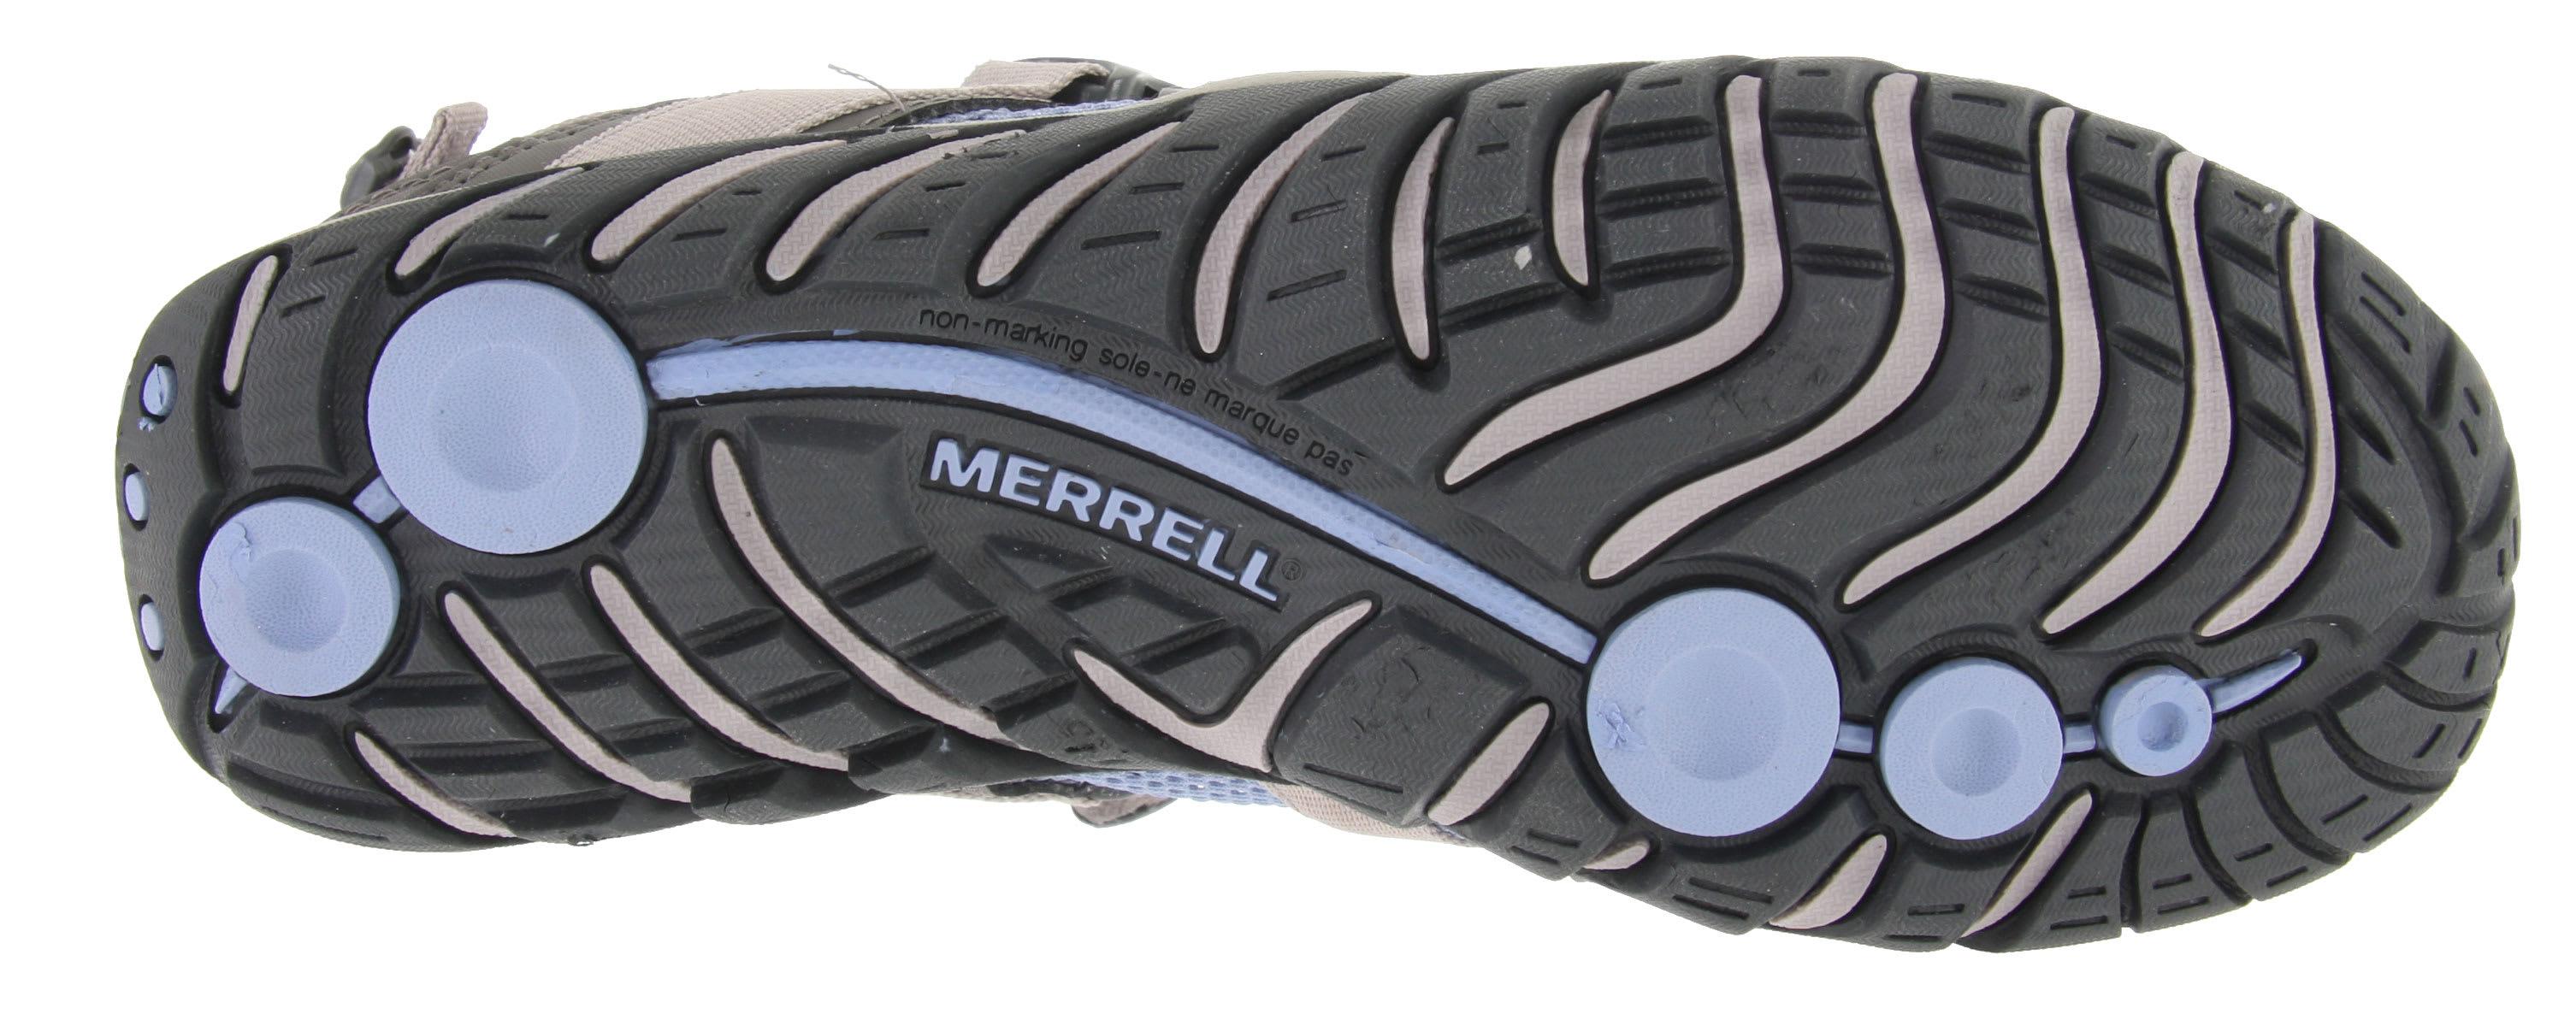 2724e8bd3d0 Merrell Waterpro Crystal Water Shoes - thumbnail 3